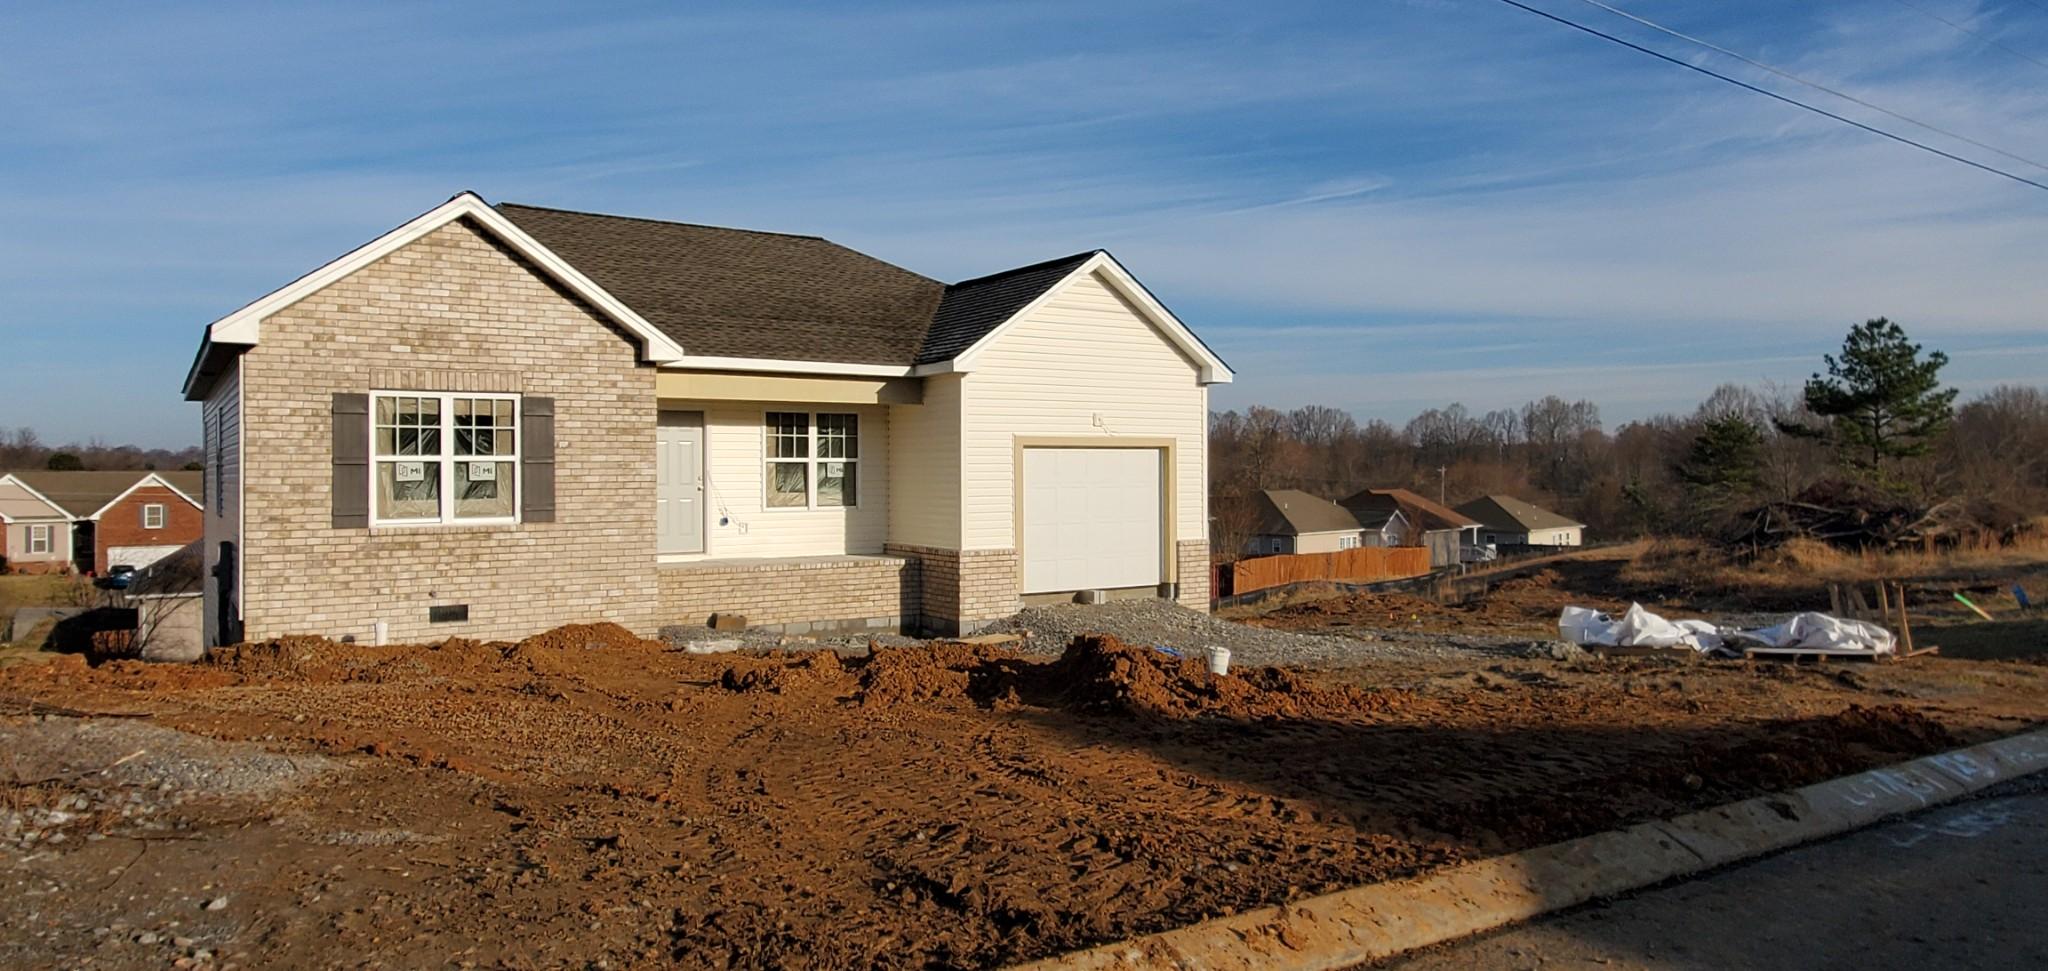 123 Sage Dr, Springfield, TN 37172 - Springfield, TN real estate listing